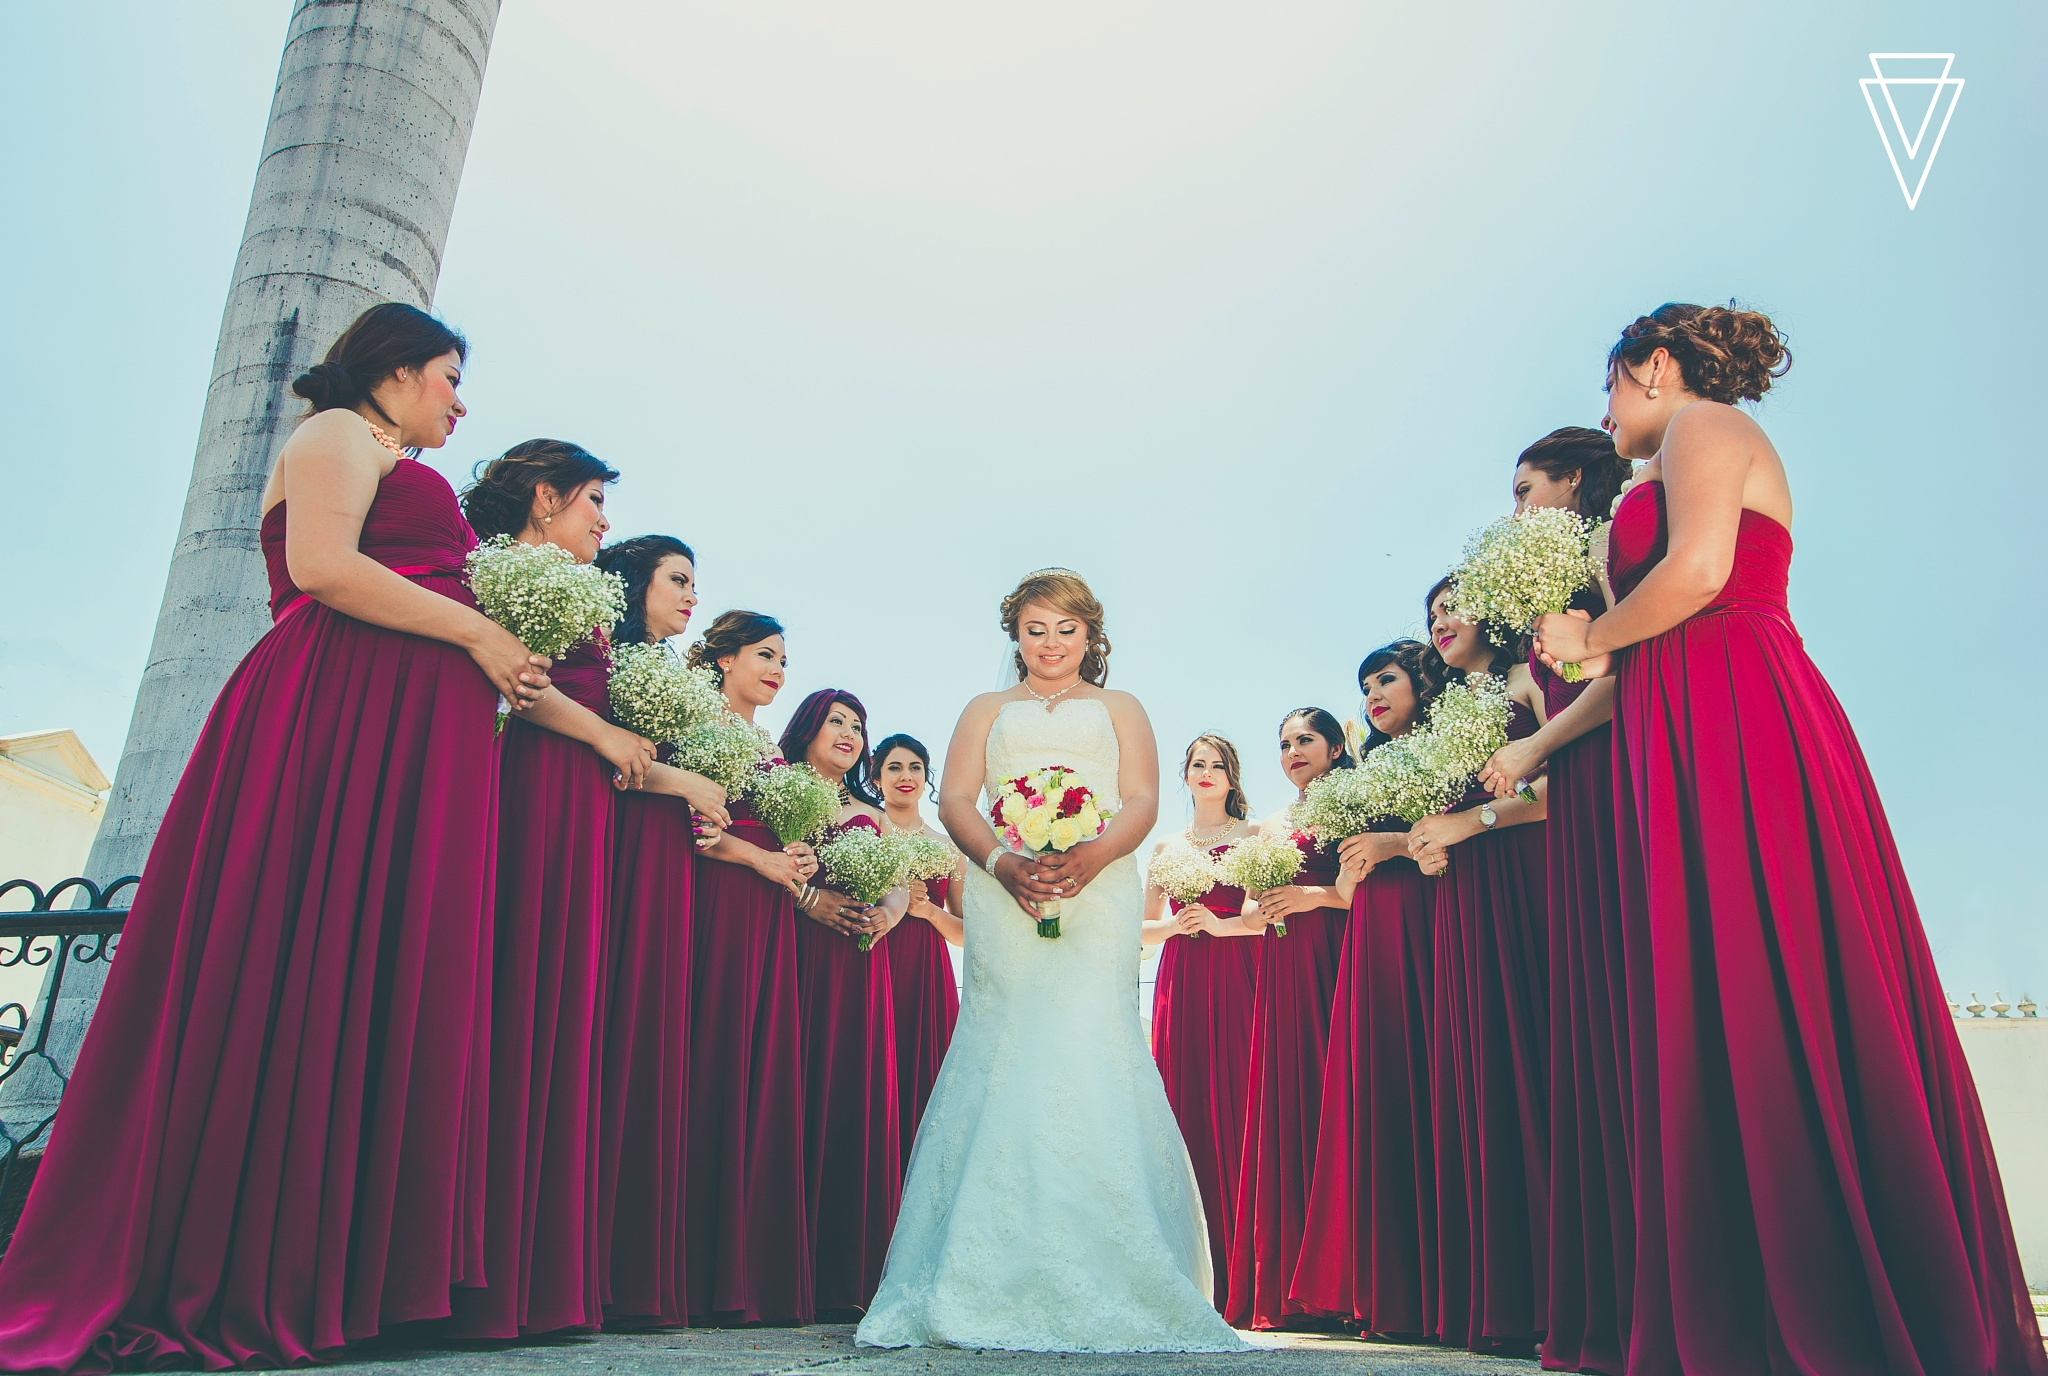 Wedding and bridesmaids by juangonzalezphotographer